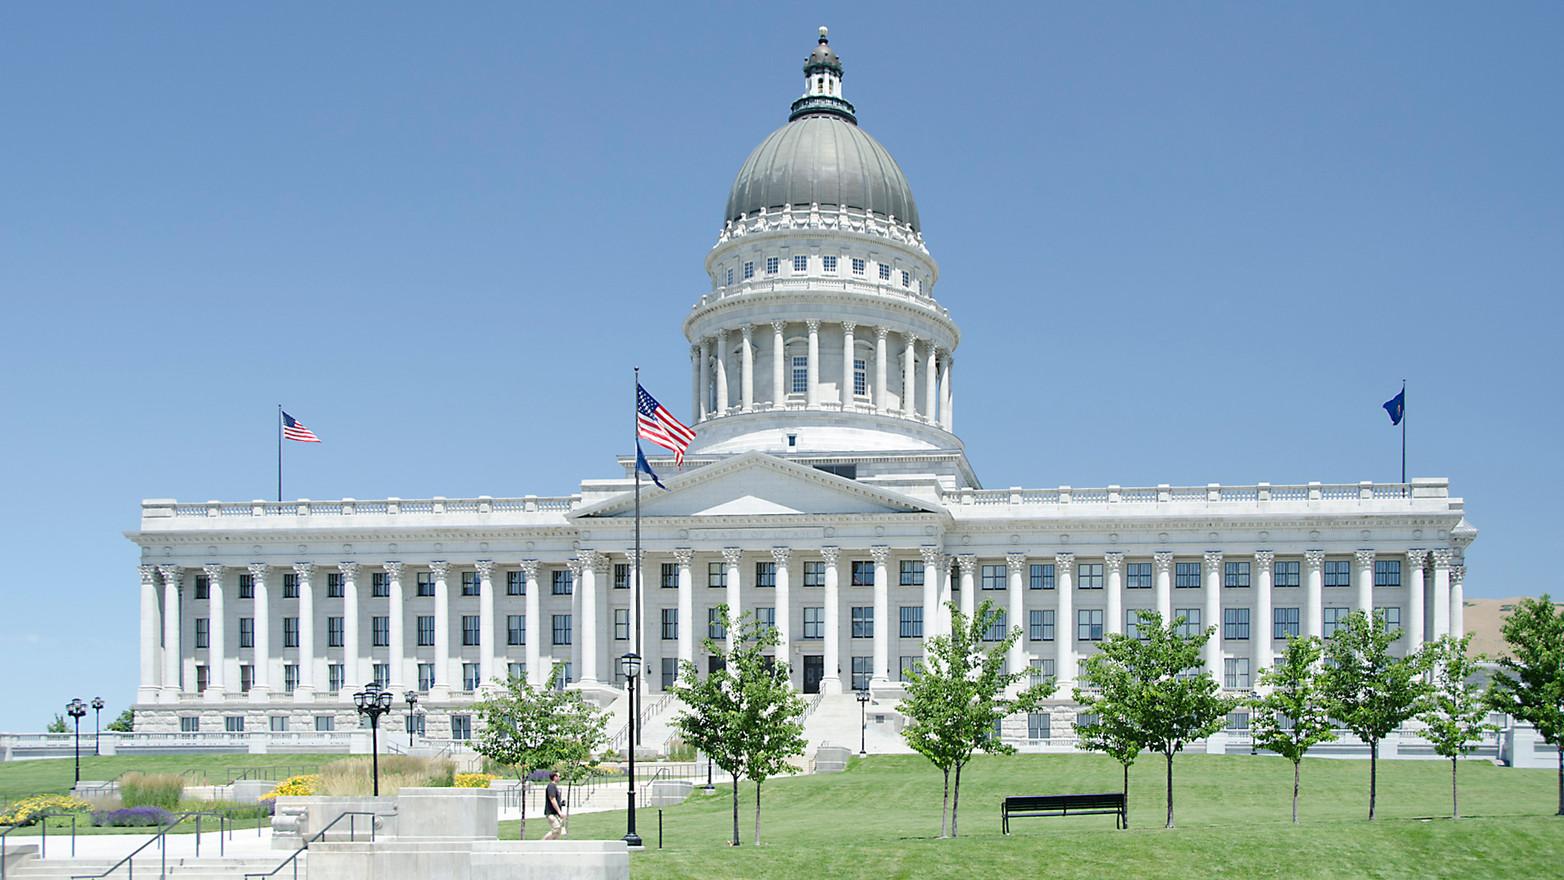 Salt Lake City, Parliament